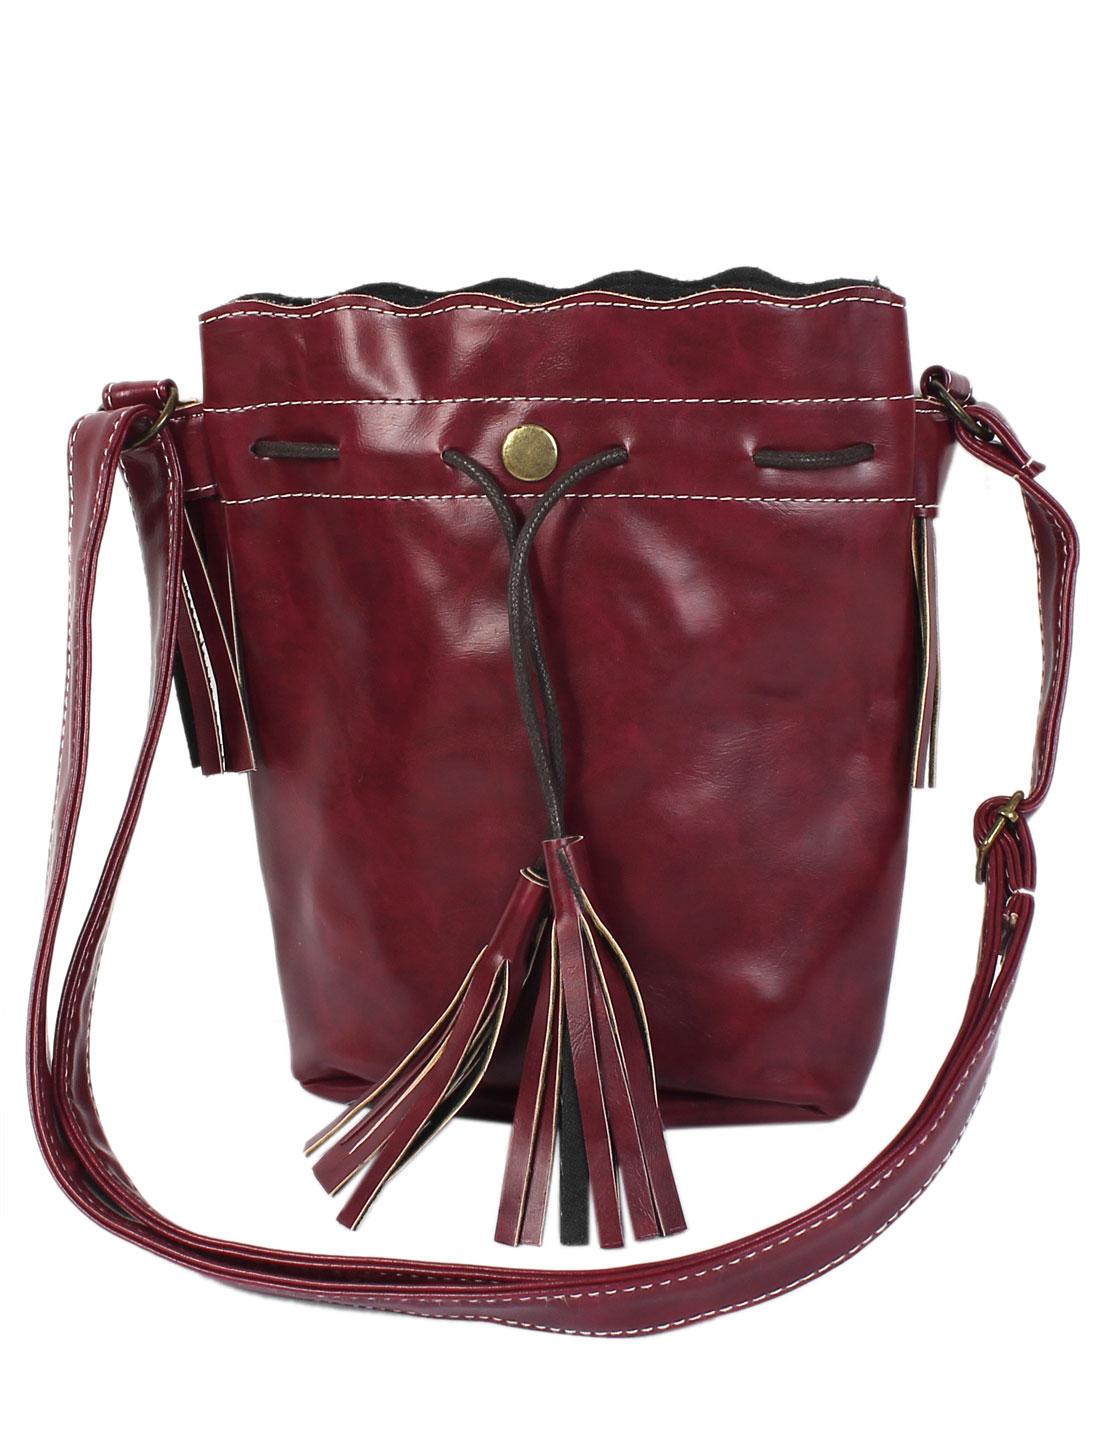 New Tassel Handbag Women Shoulder Messenger Hobo Bag Purse Satchel Burgundy